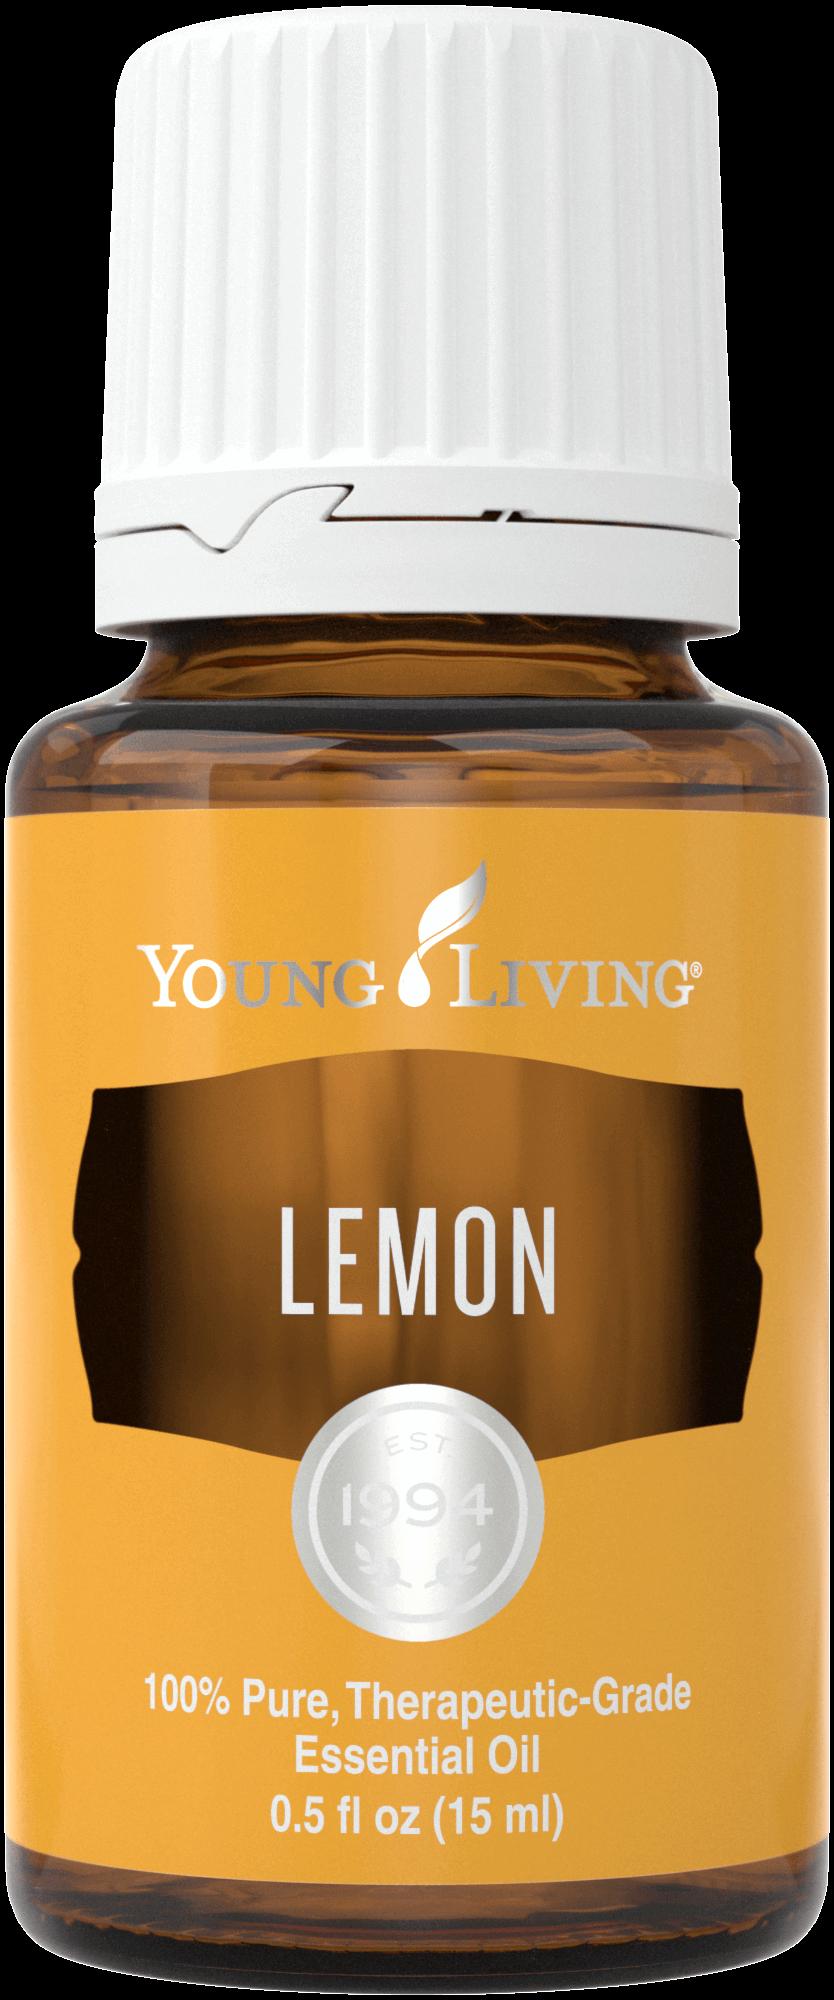 Ätherisches Öl Young Living: Zitrone Öl (Lemon) 15ml